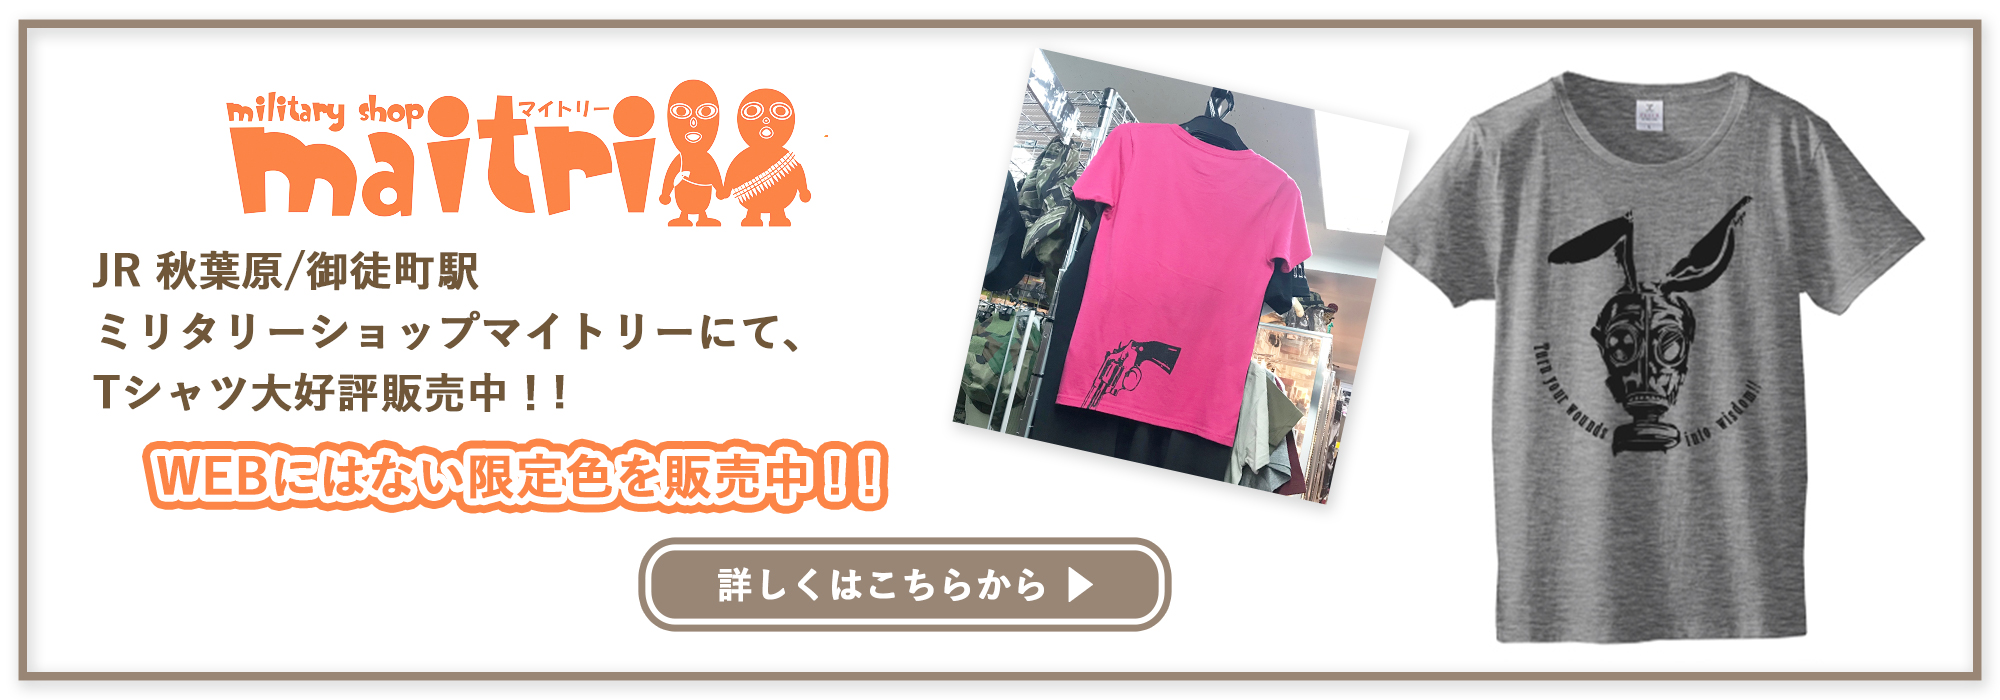 JR 秋葉原/御徒町駅 ミリタリーショップマイトリーにて、 Tシャツ好評発売中!!